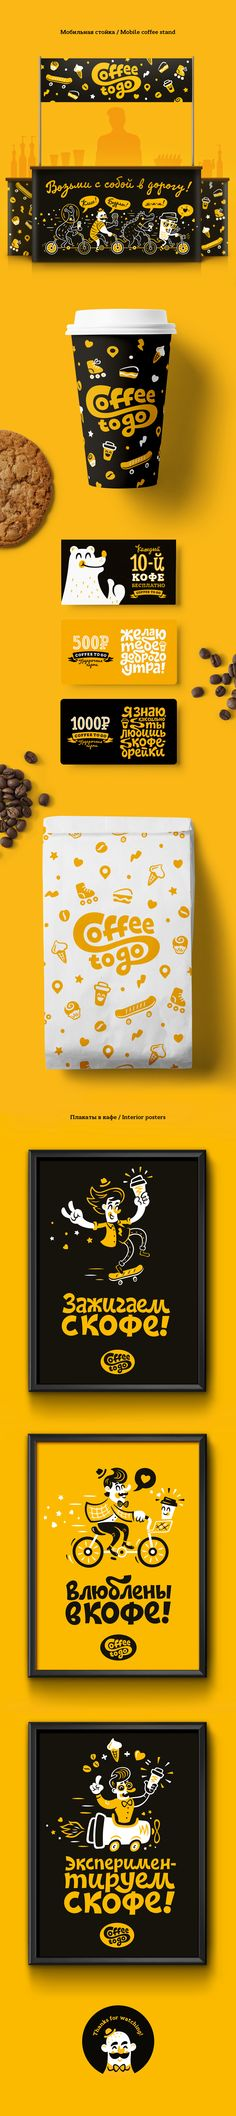 53 Ideas For Design Packaging Food Logo Identity Branding Design Visual, Graphisches Design, Logo Design, Design Poster, Brand Identity Design, Graphic Design Branding, Creative Design, Brand Design, Design Ideas